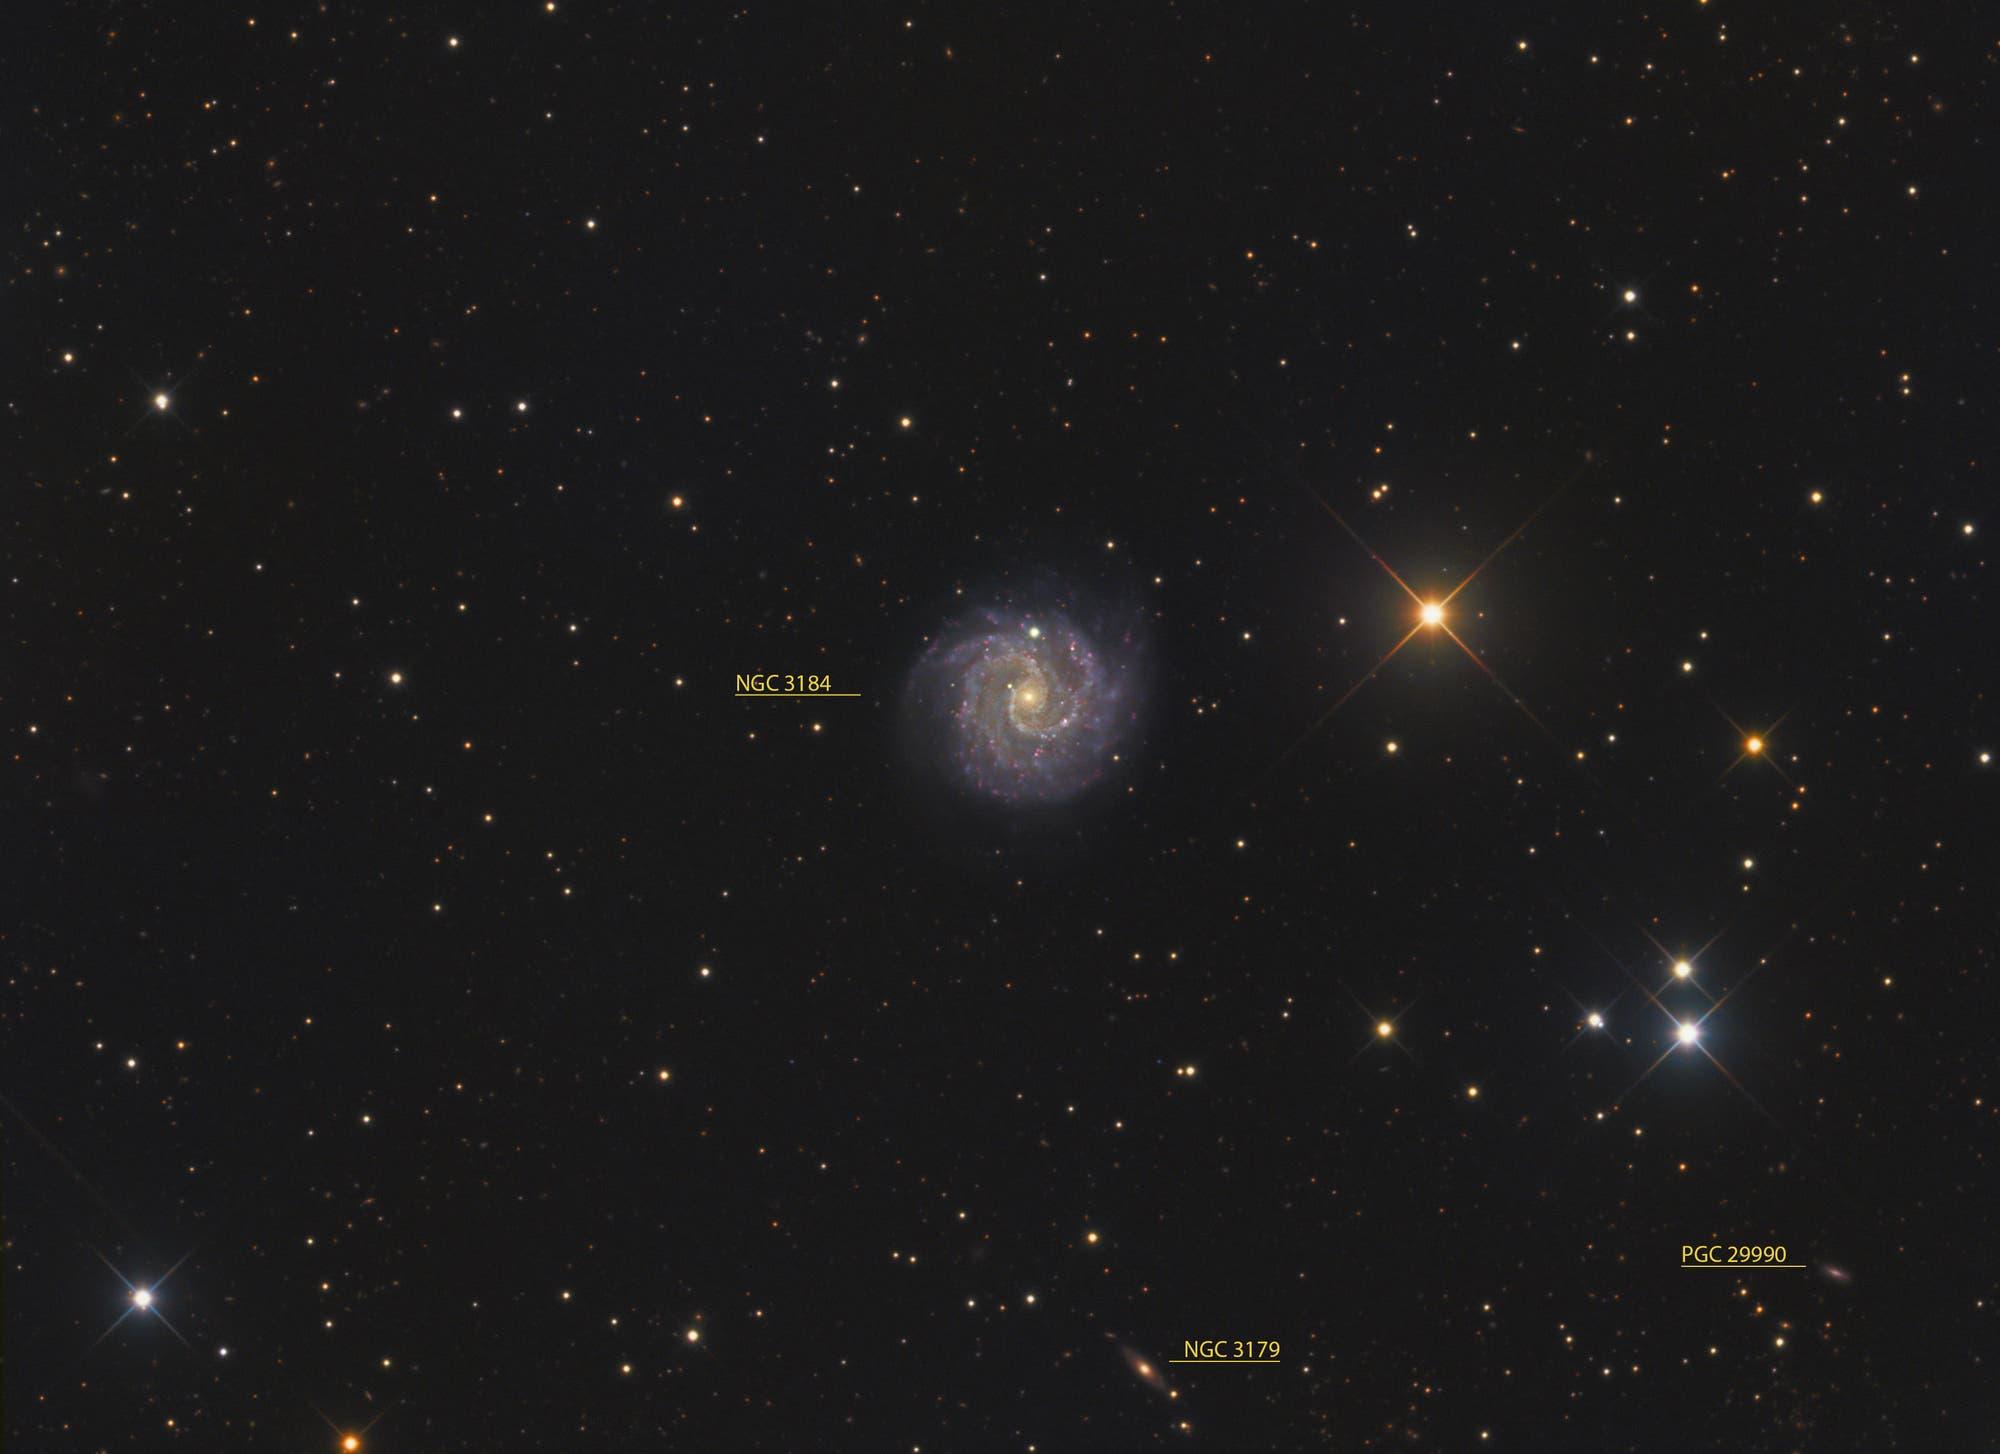 NGC 3184 (Objekte)